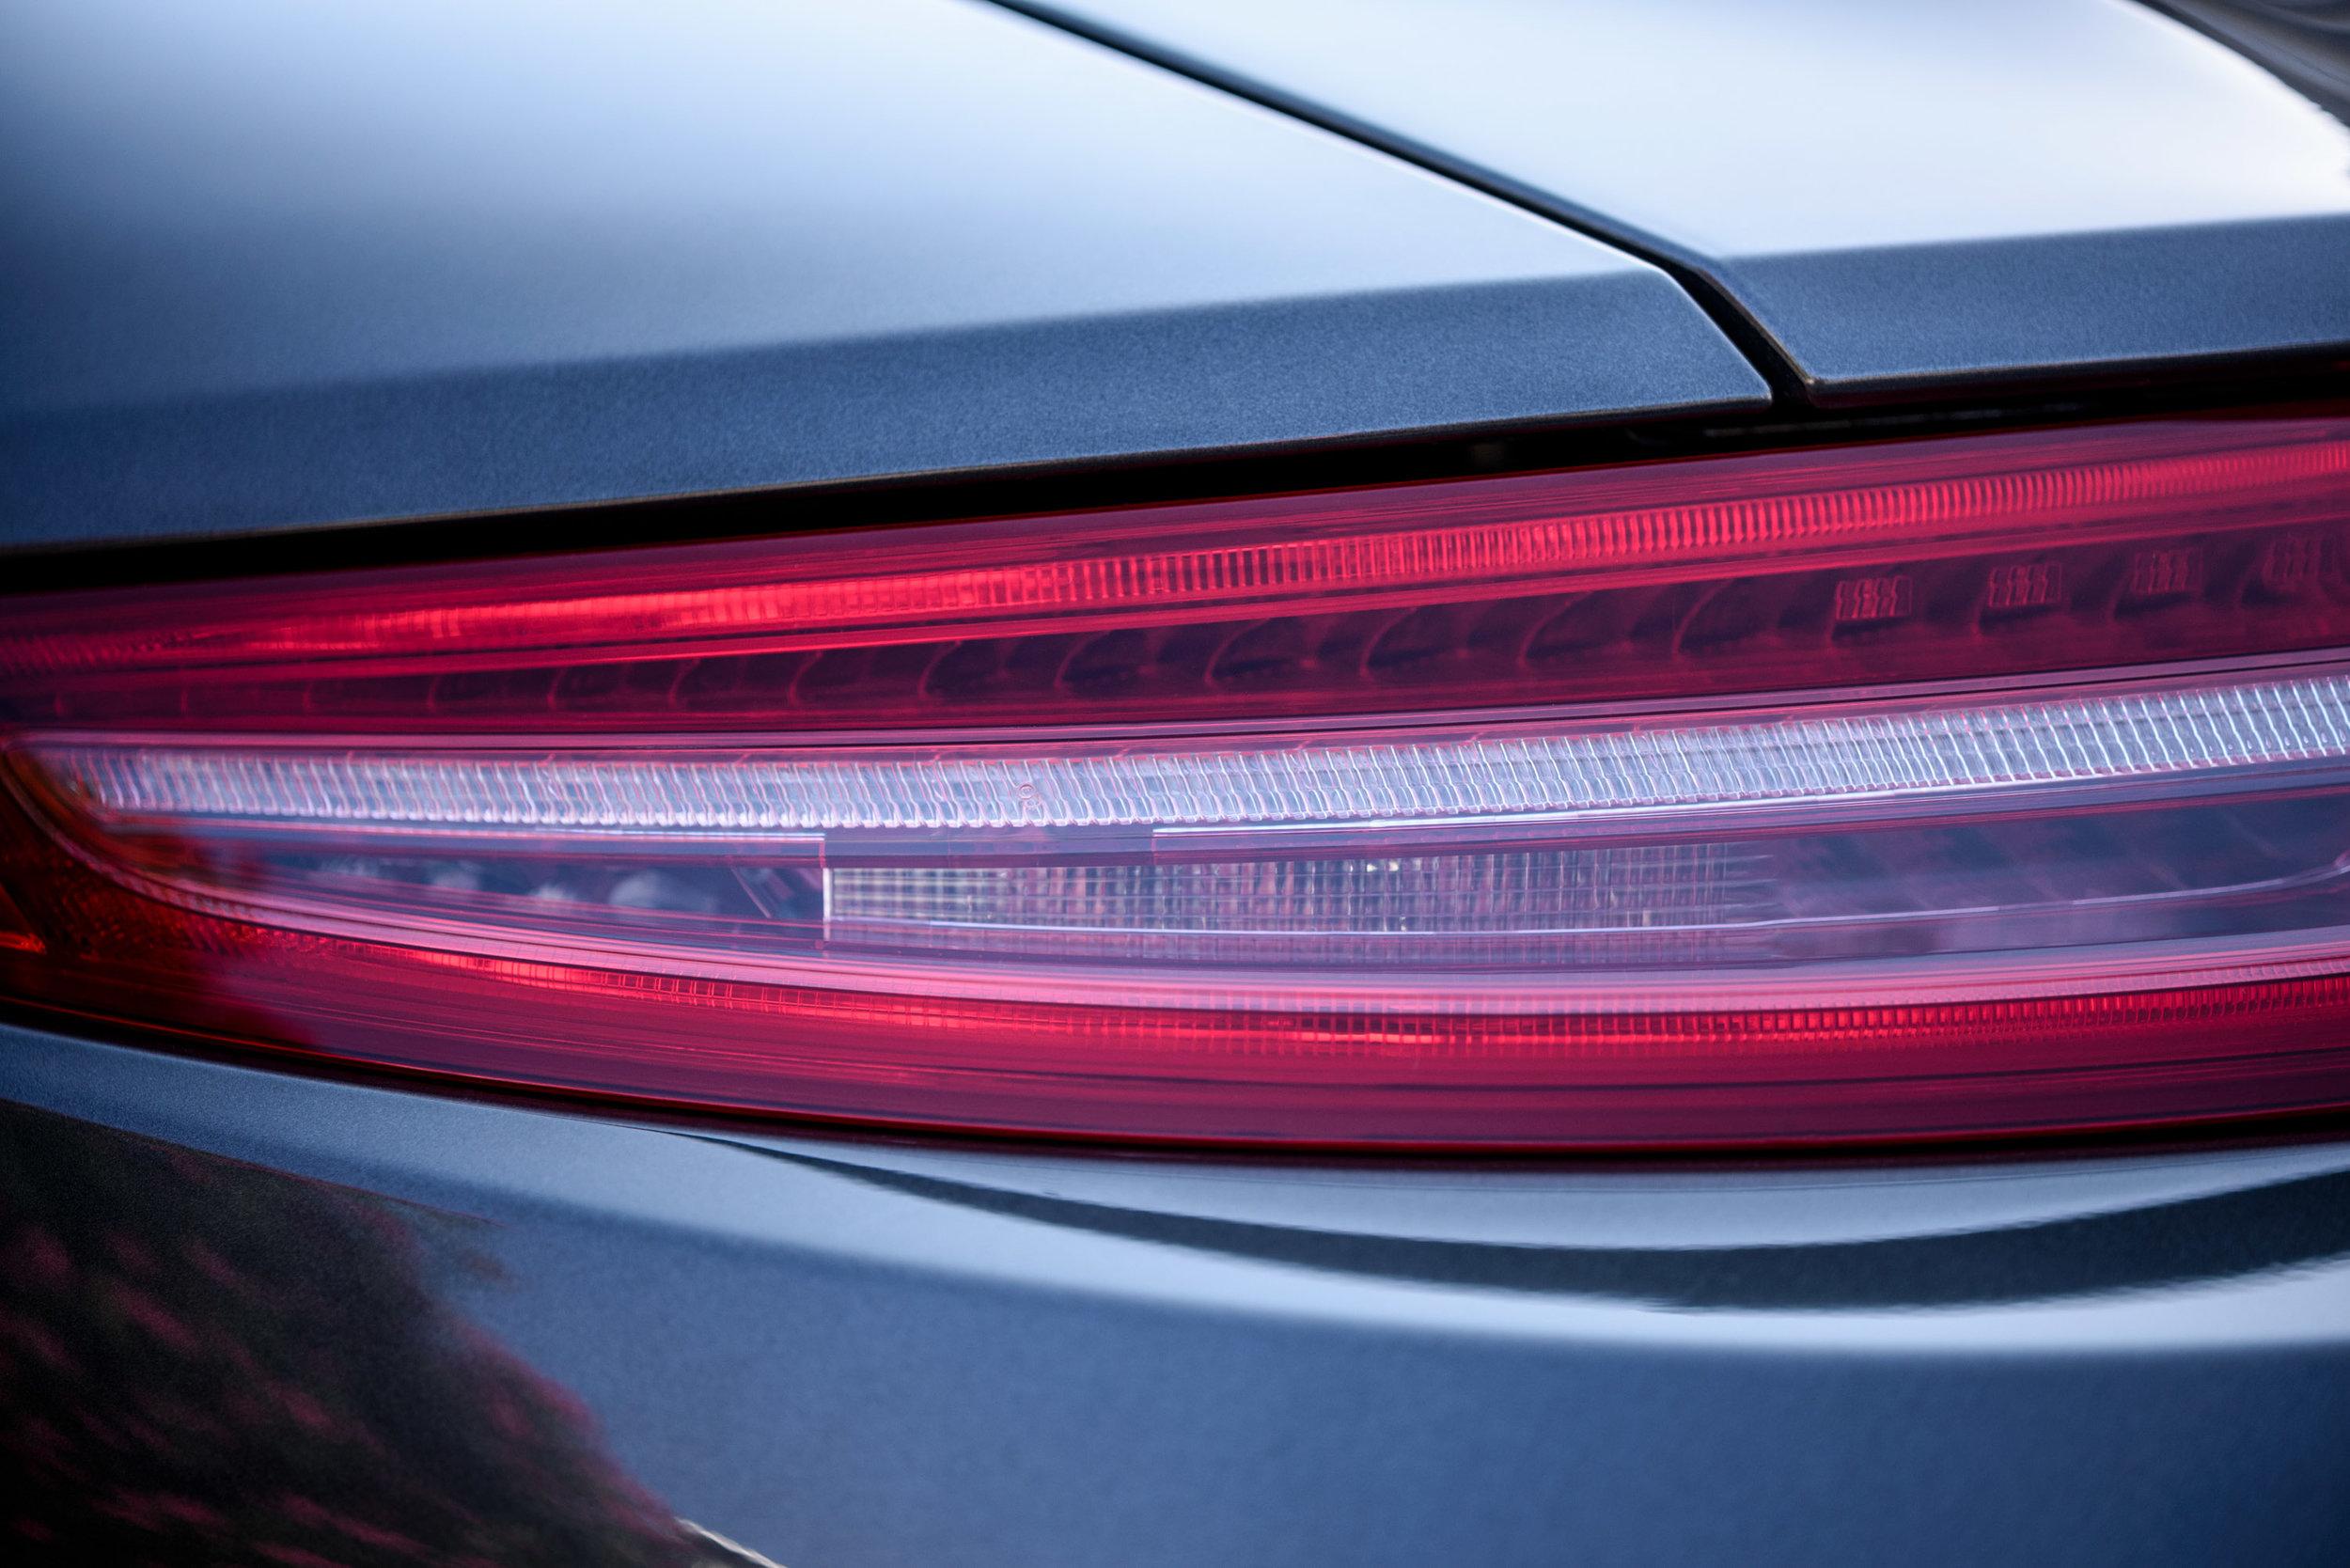 porsche 911 carrera s 2012 red taillight by Jordan Reeder